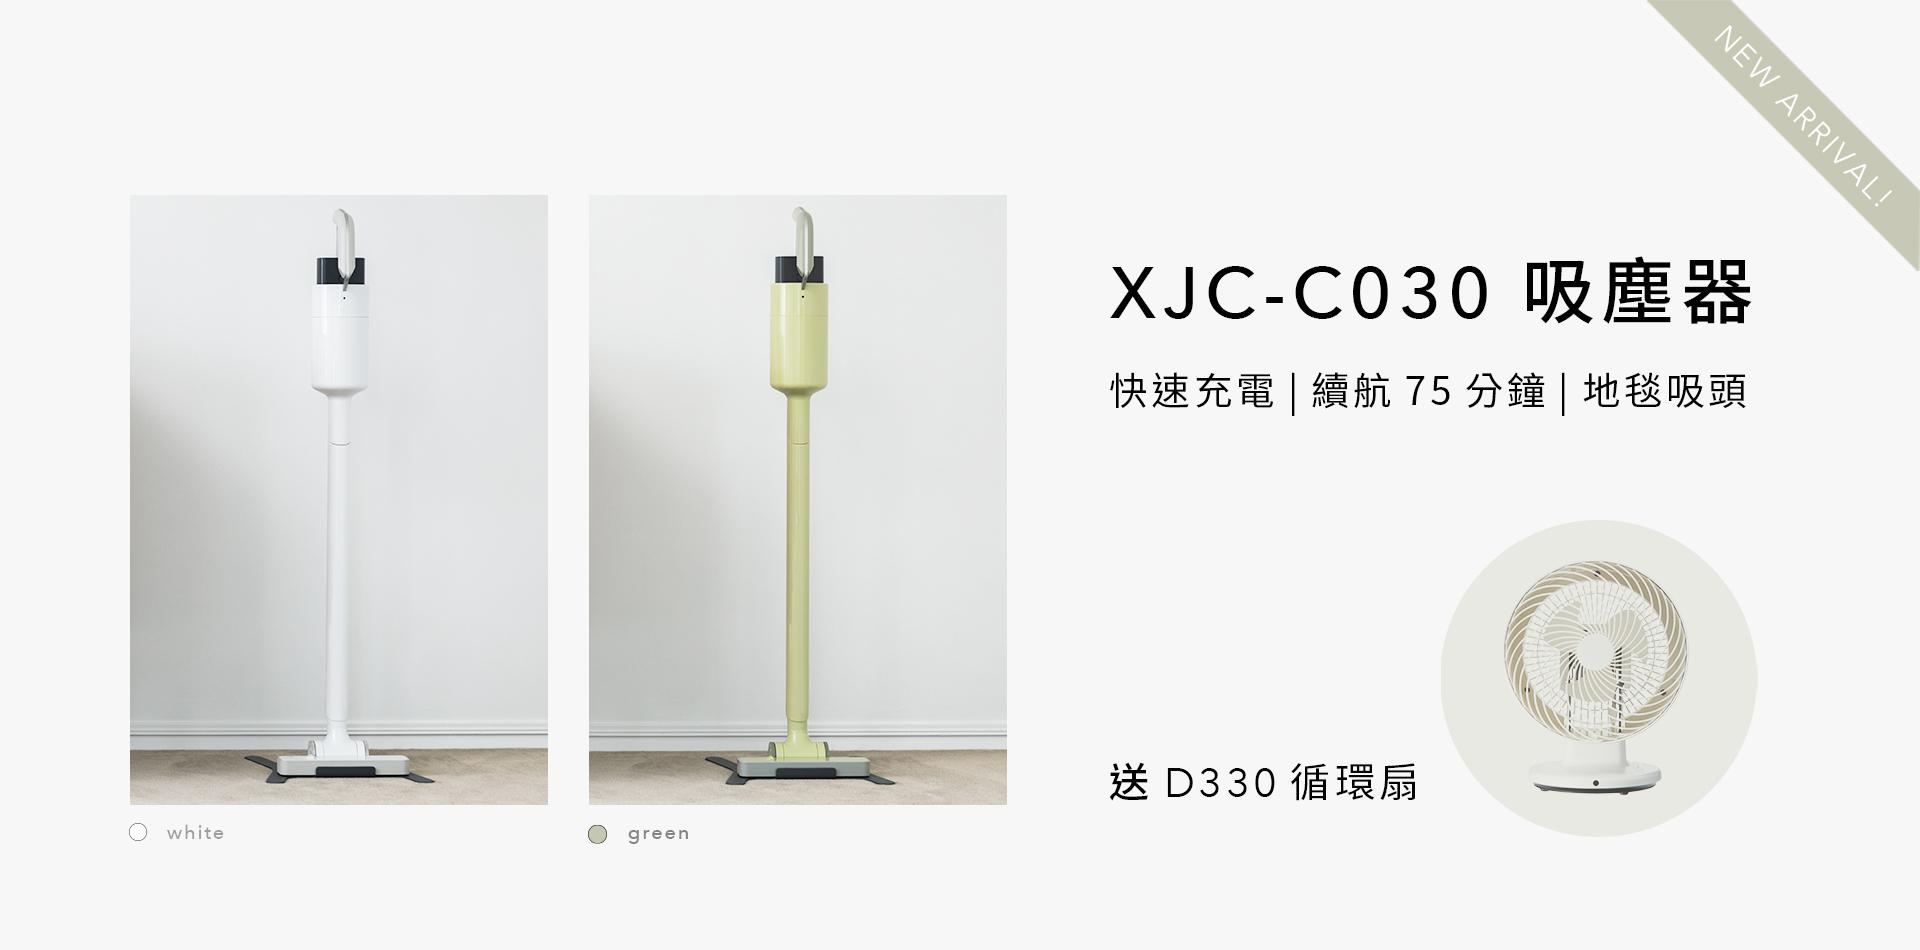 XJC-C030 無線吸塵器(送循環扇)